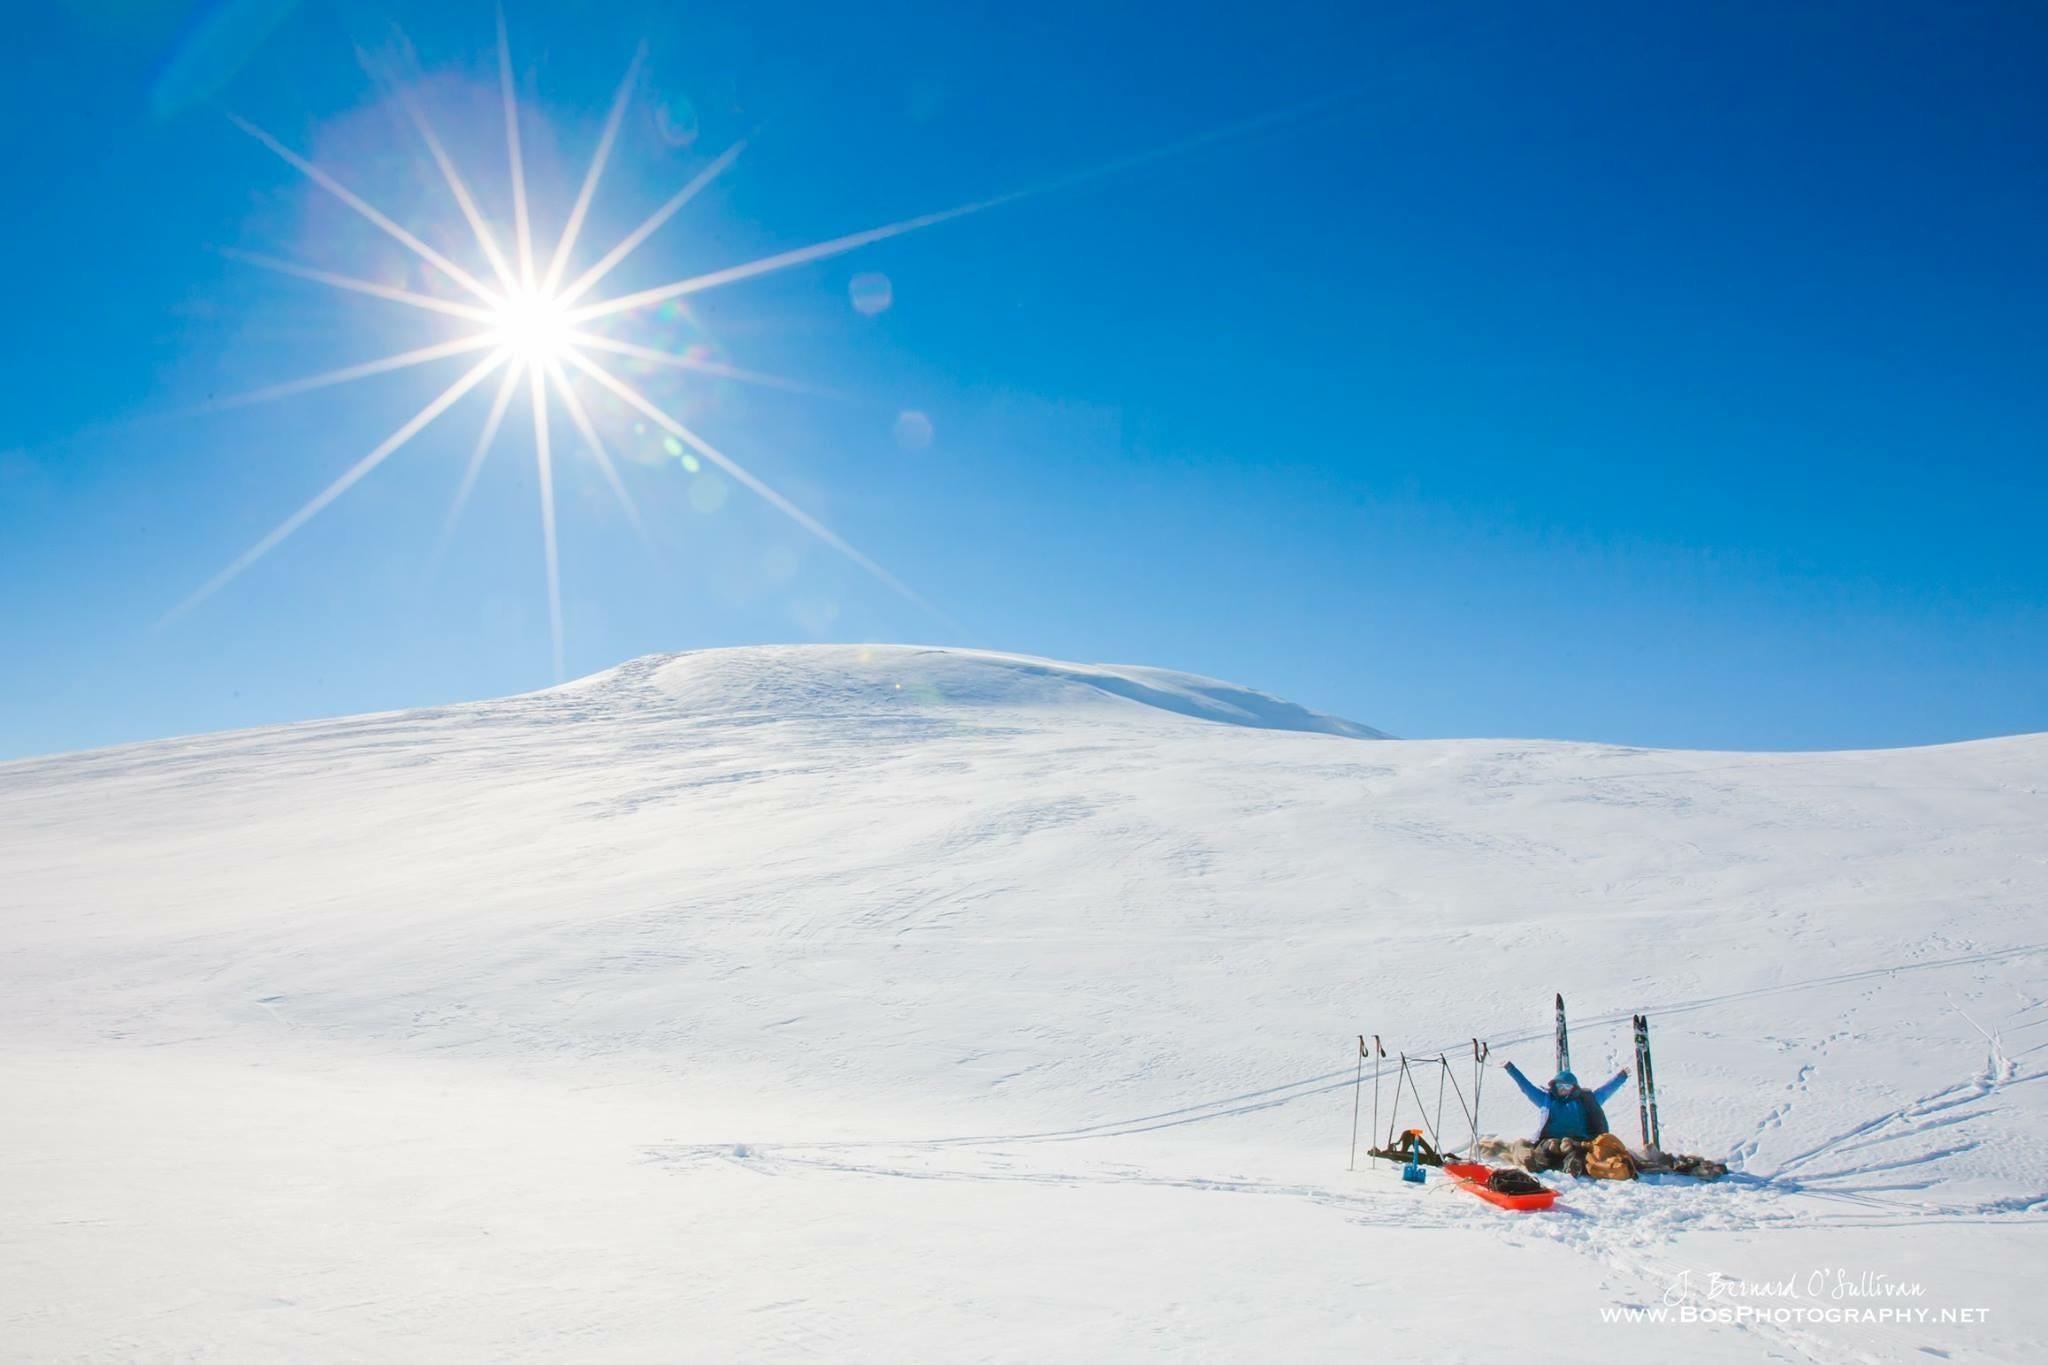 Skiekspedisjoner - Tundra Tours